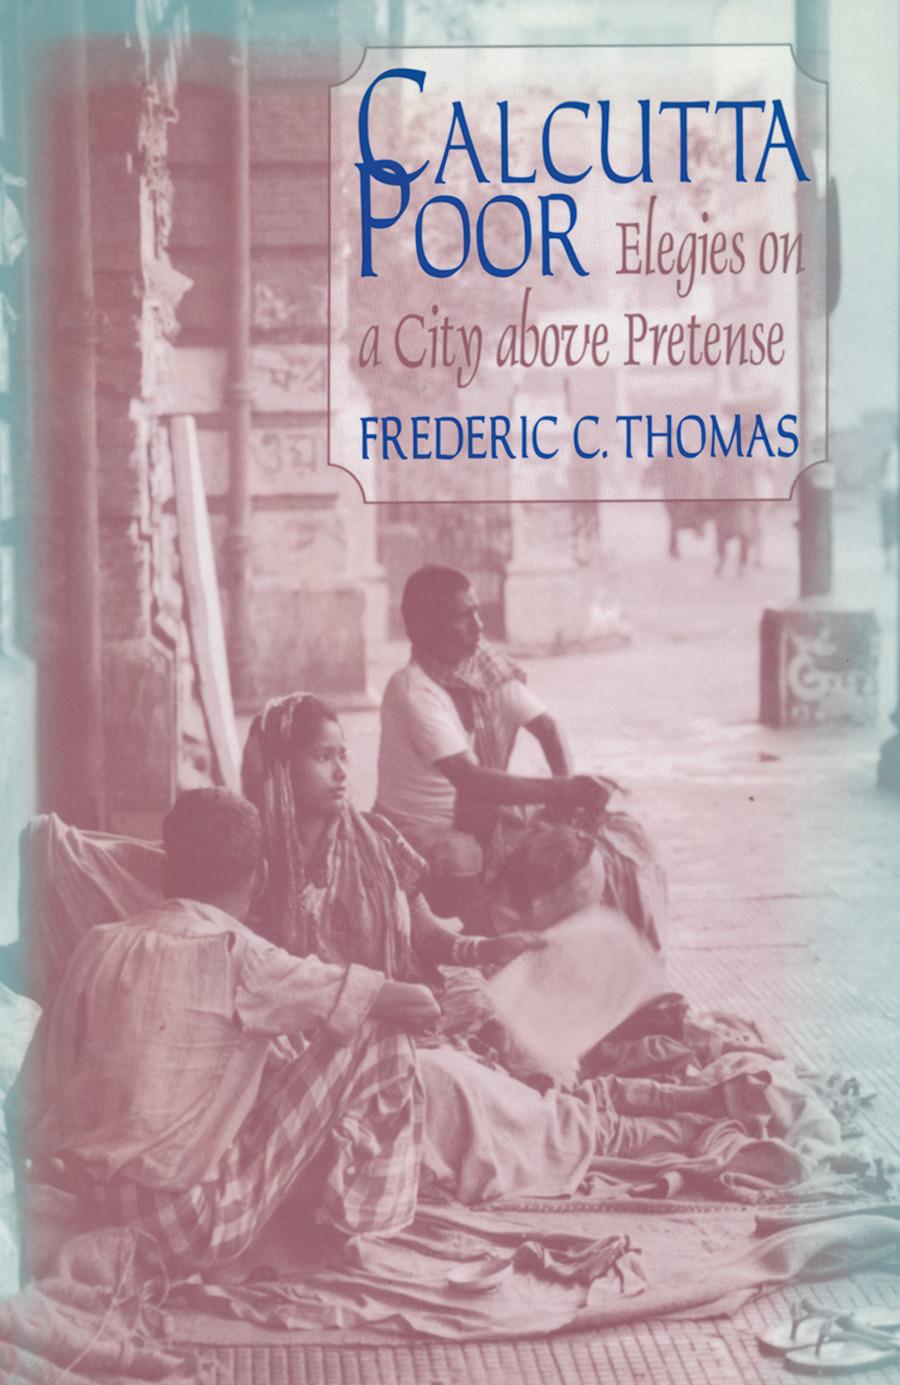 Calcutta Poor: Inquiry into the Intractability of Poverty: Inquiry into the Intractability of Poverty, 1st Edition (Hardback) book cover